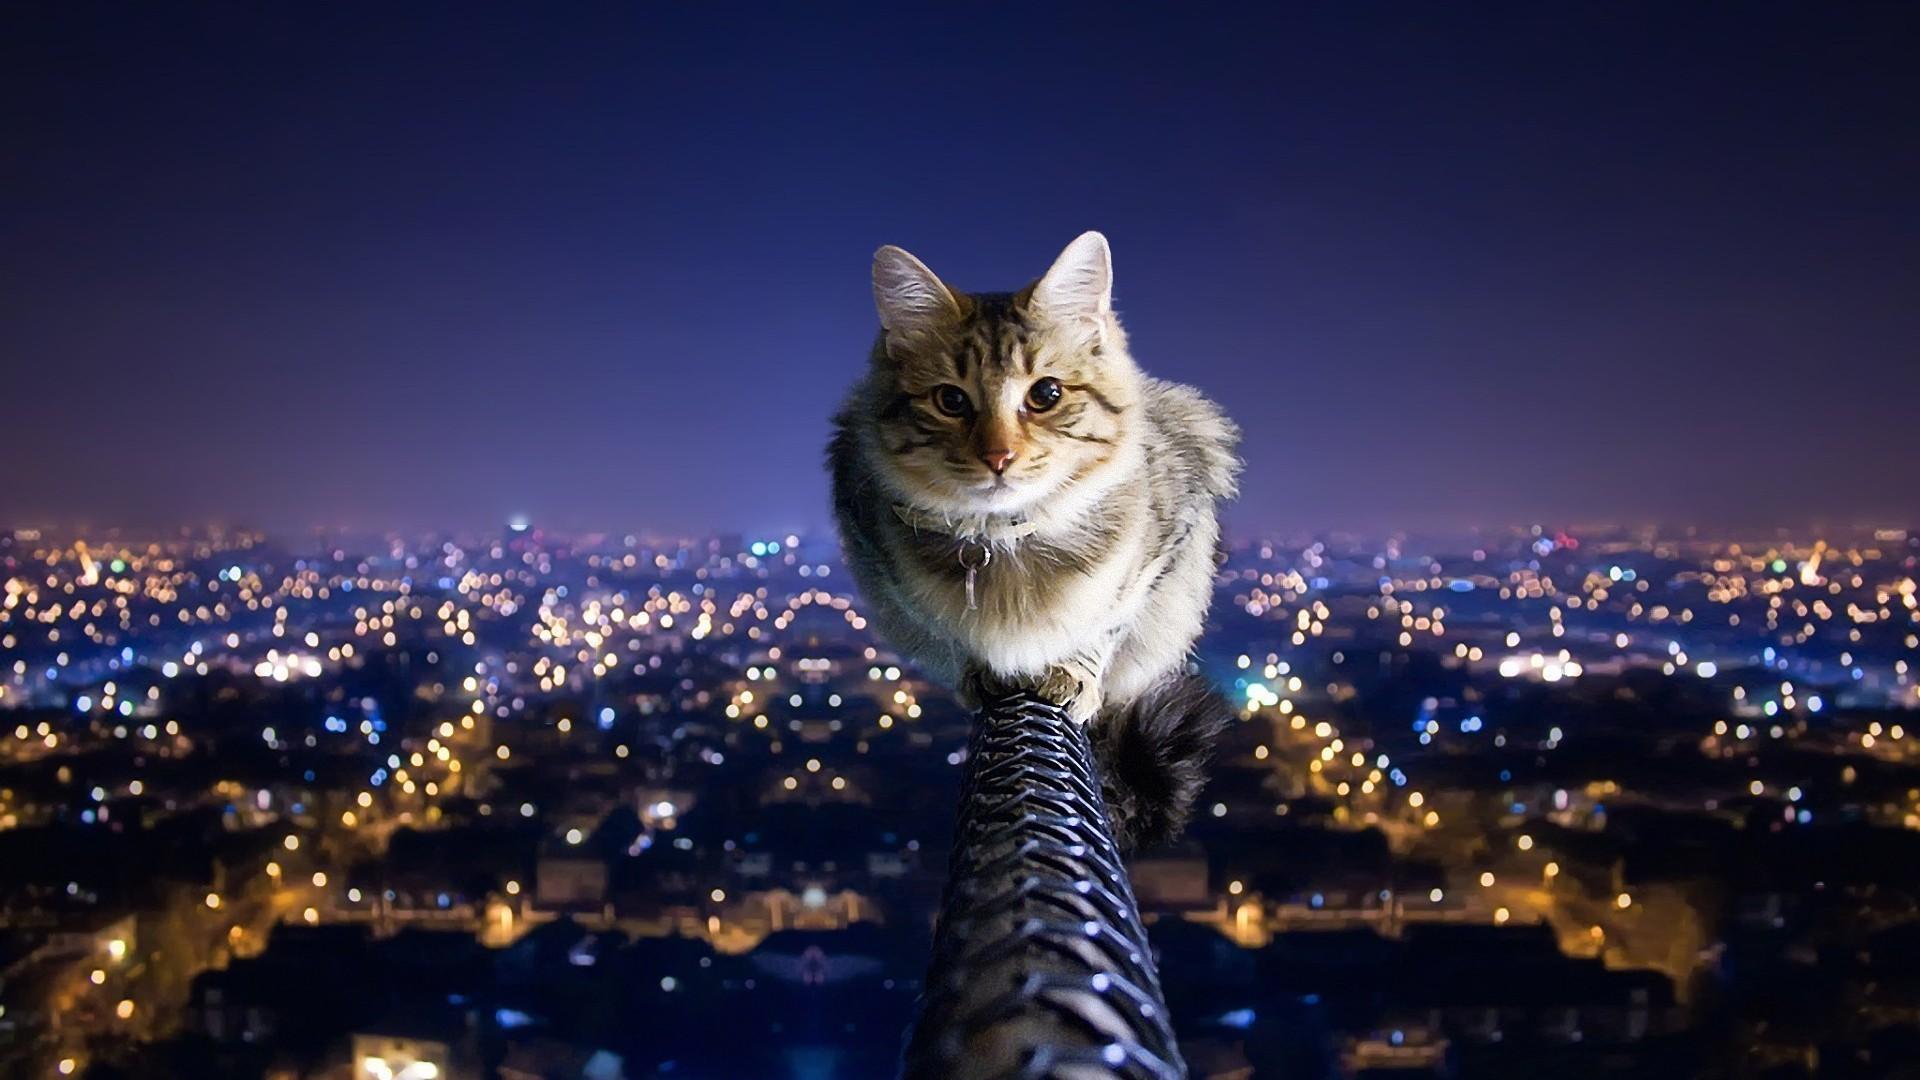 Nine lives of a cat travfashjourno